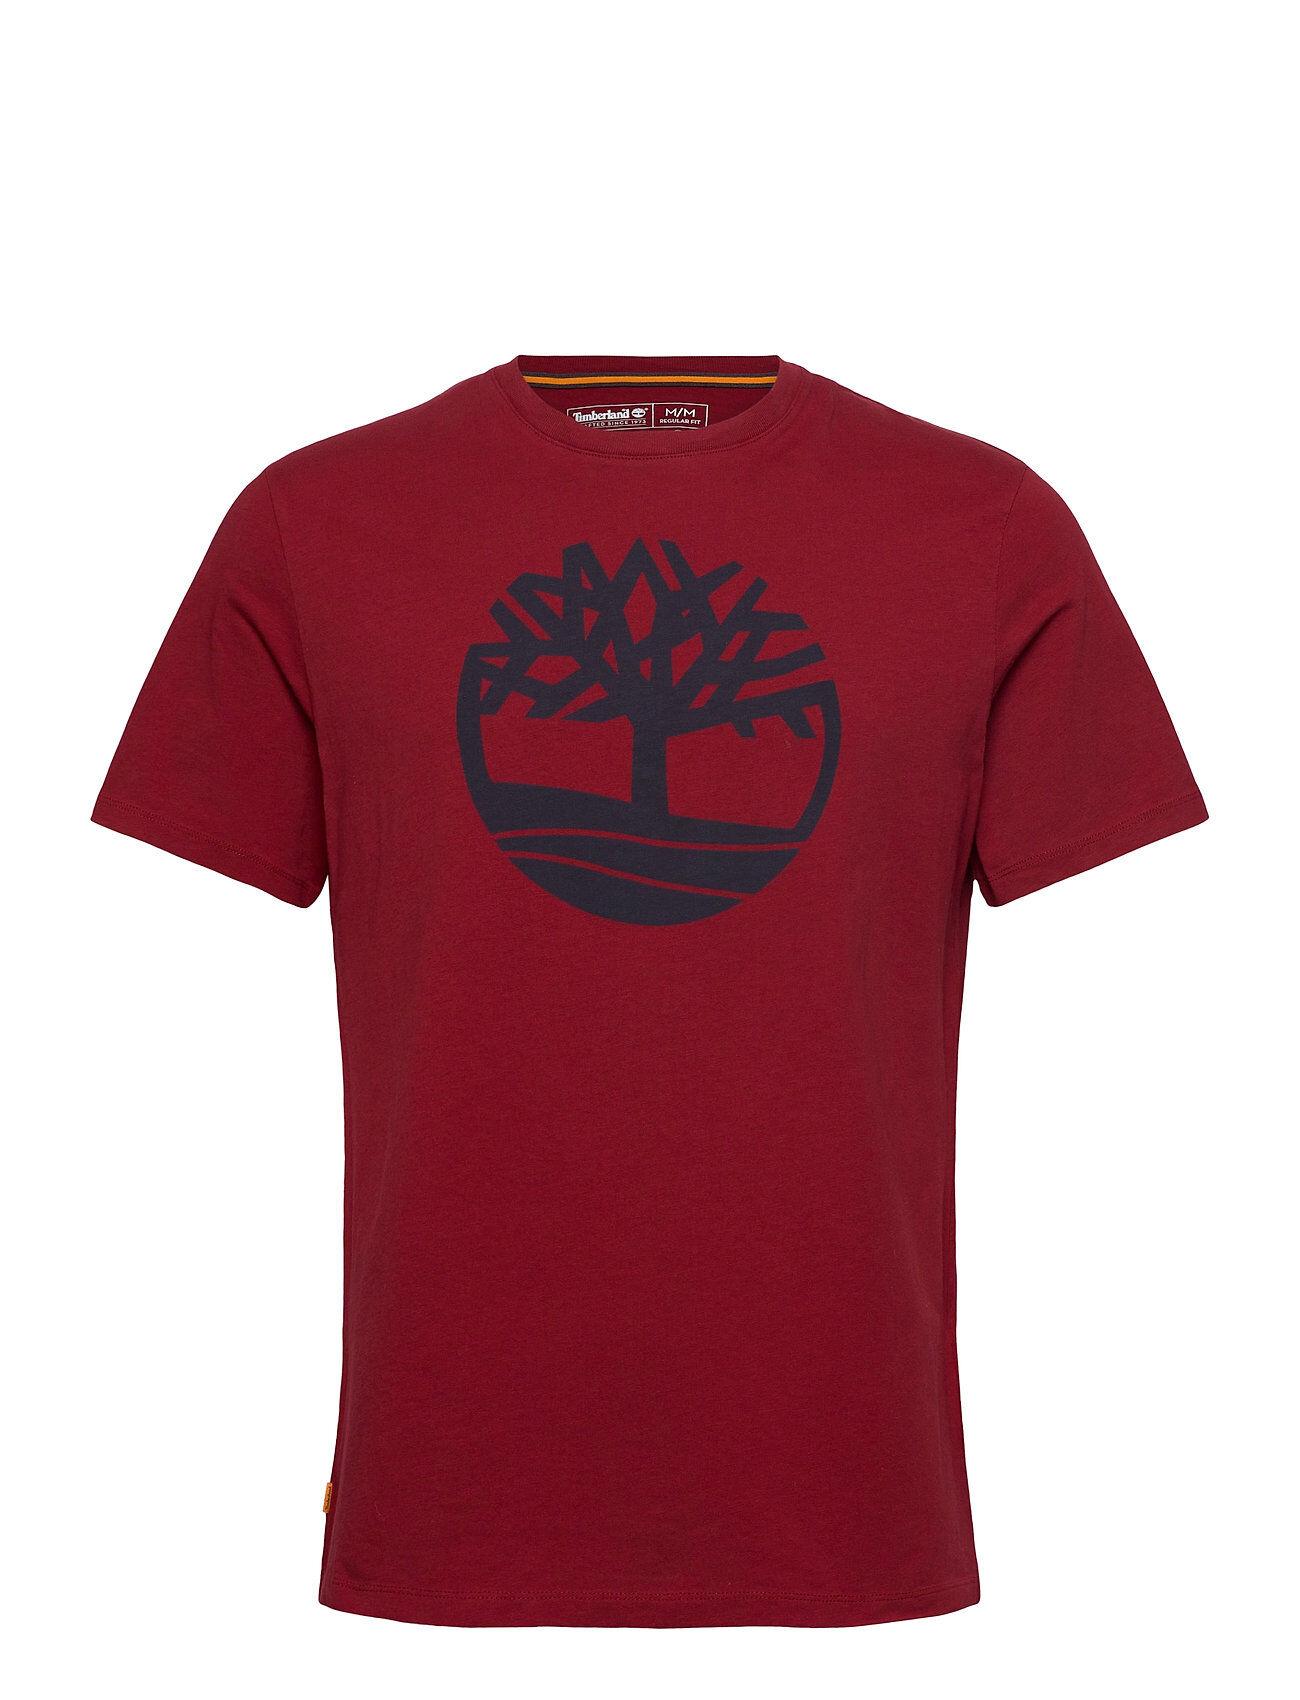 Timberland Ss K-R Brand Tree T T-shirts Short-sleeved Punainen Timberland